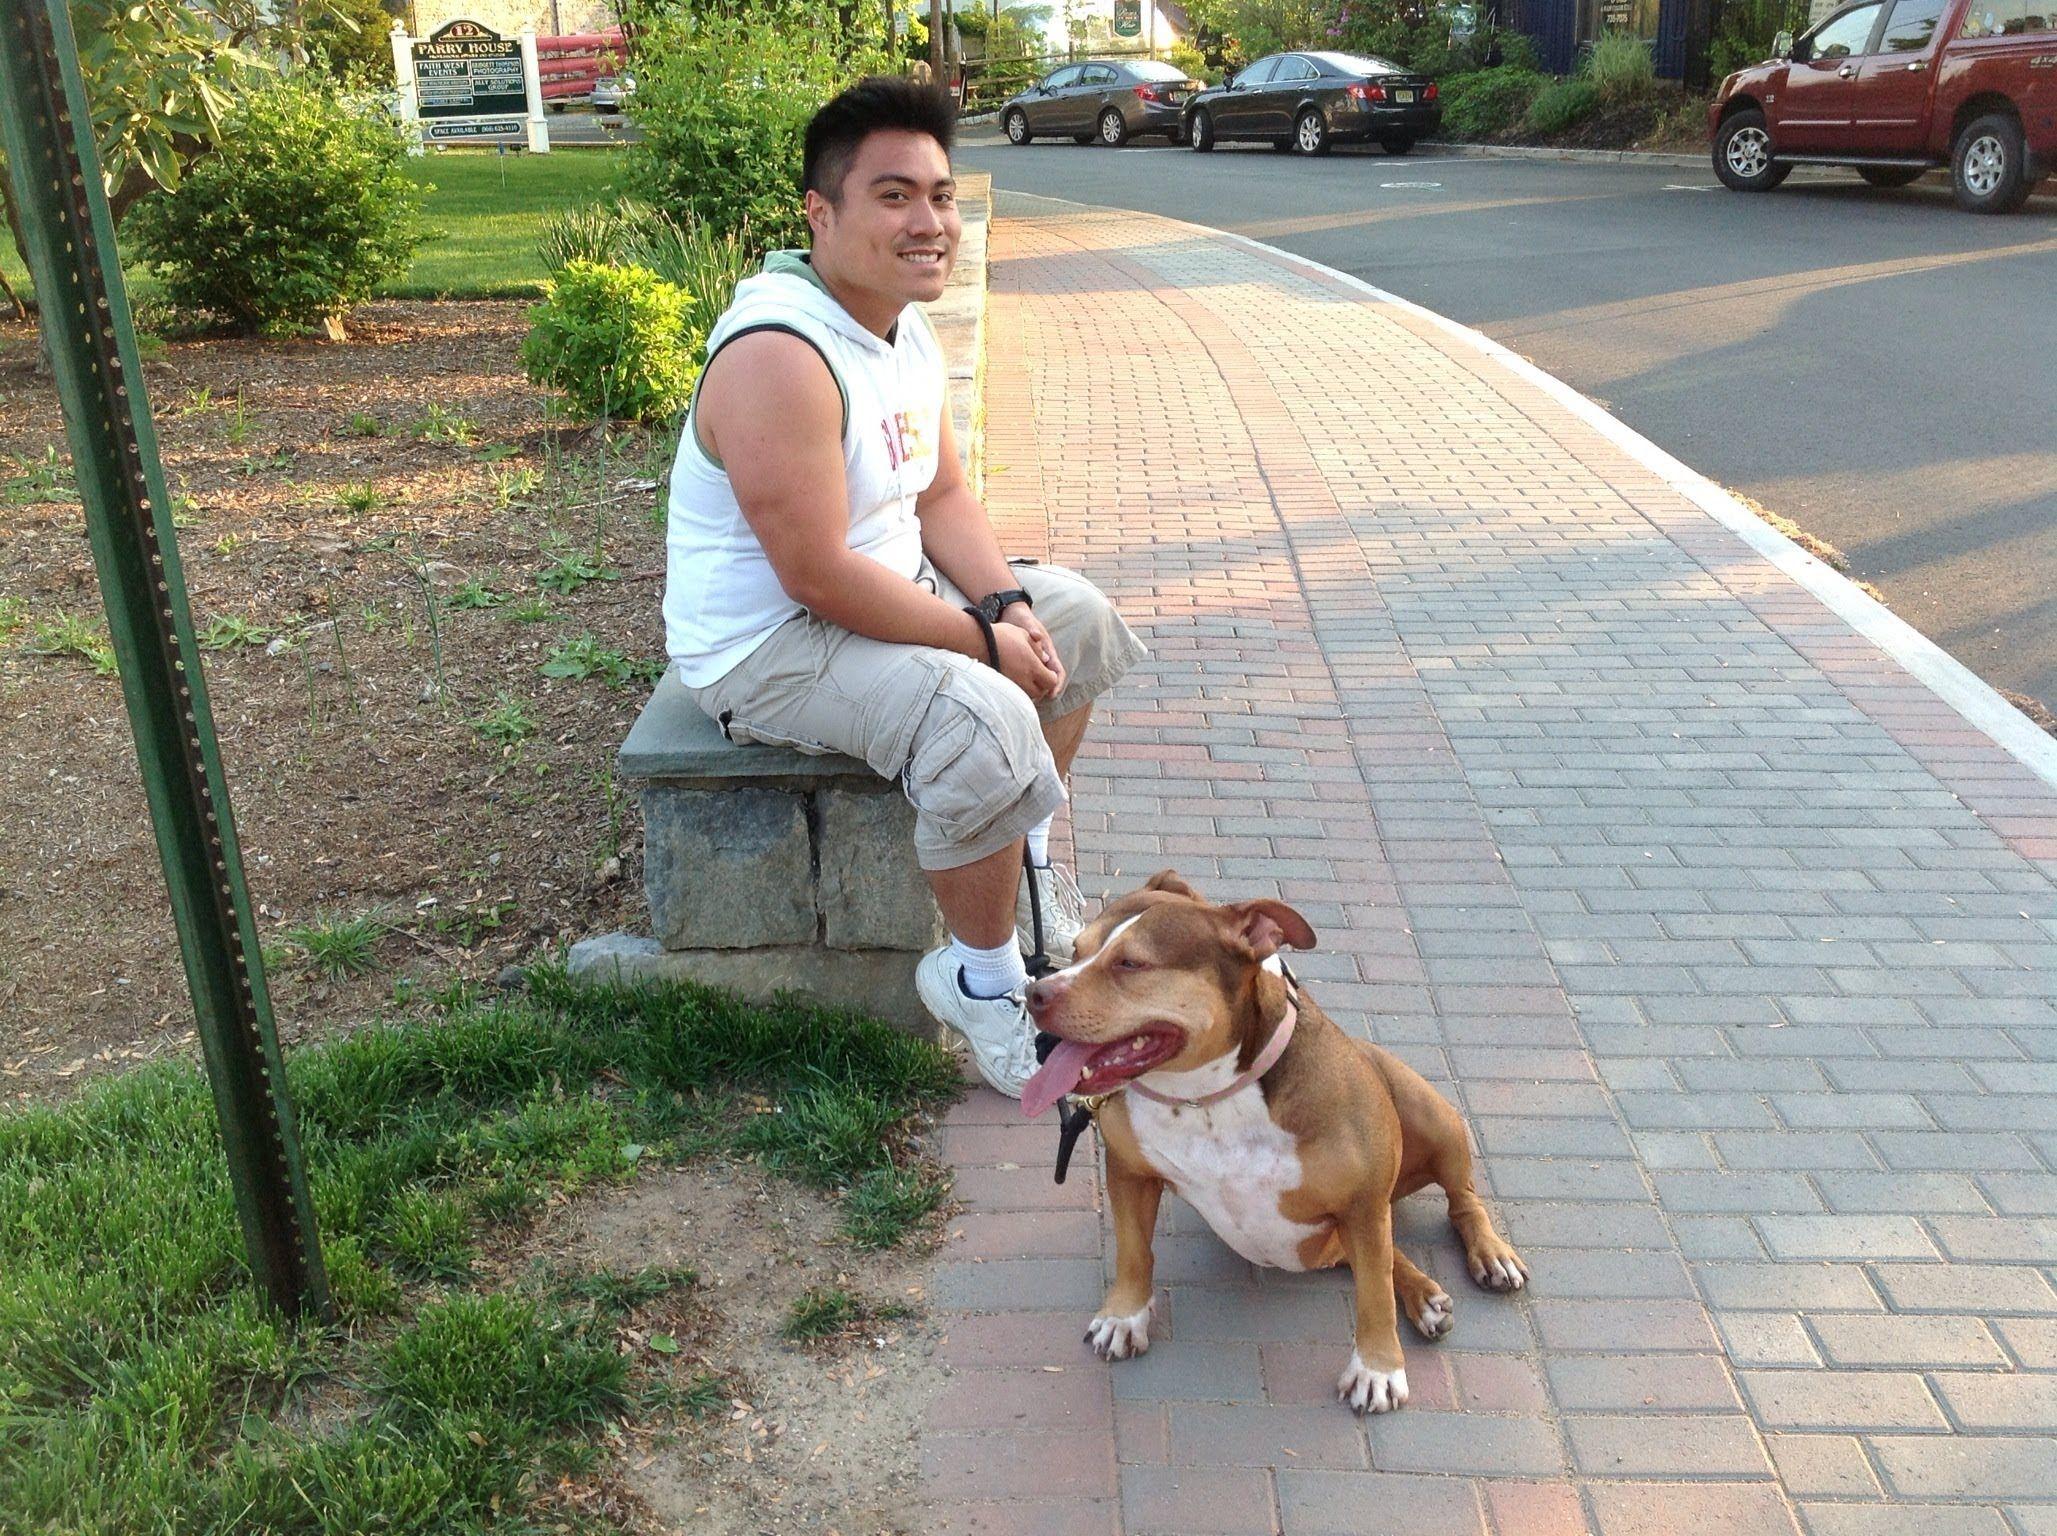 Cesar Millan Training Dog To Walk On Leash